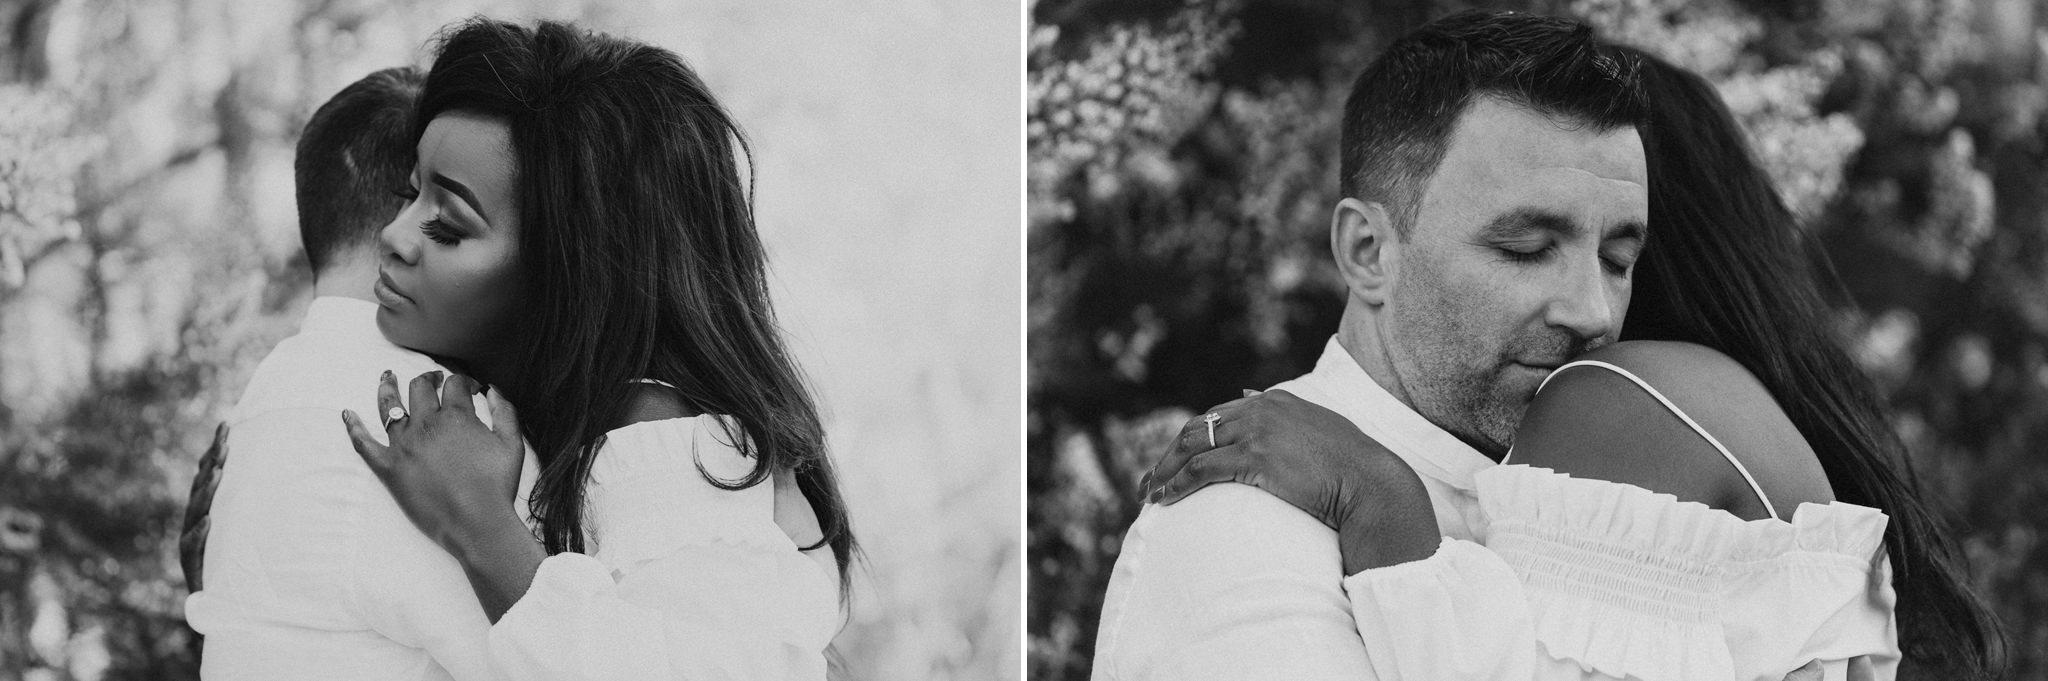 dundee-engagement-wedding-photographer-15.jpg